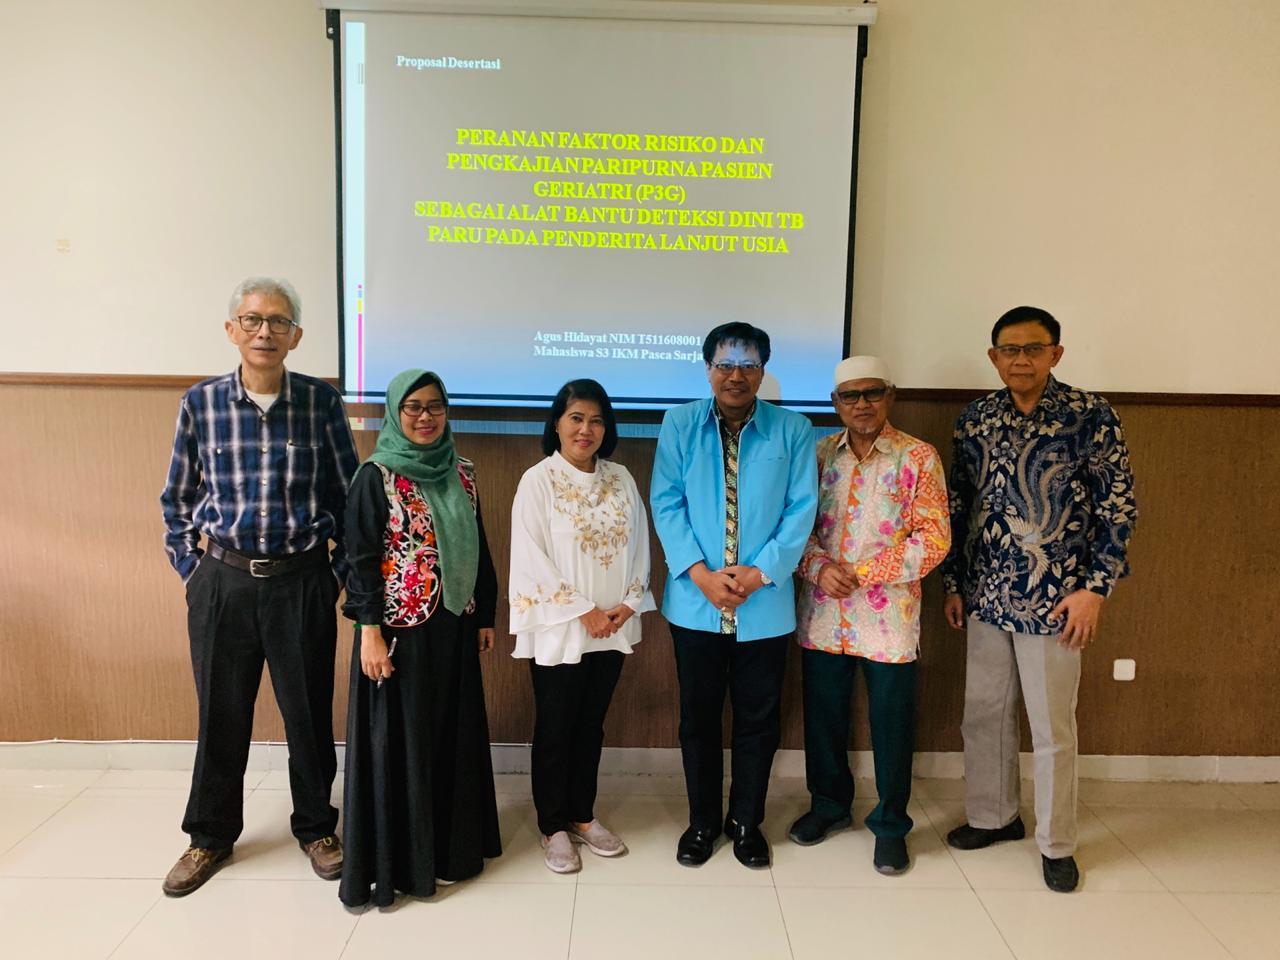 Ujian Proposal Disertasi Mahasiswa S3 IKM UNS a.n. Agus Hidayat